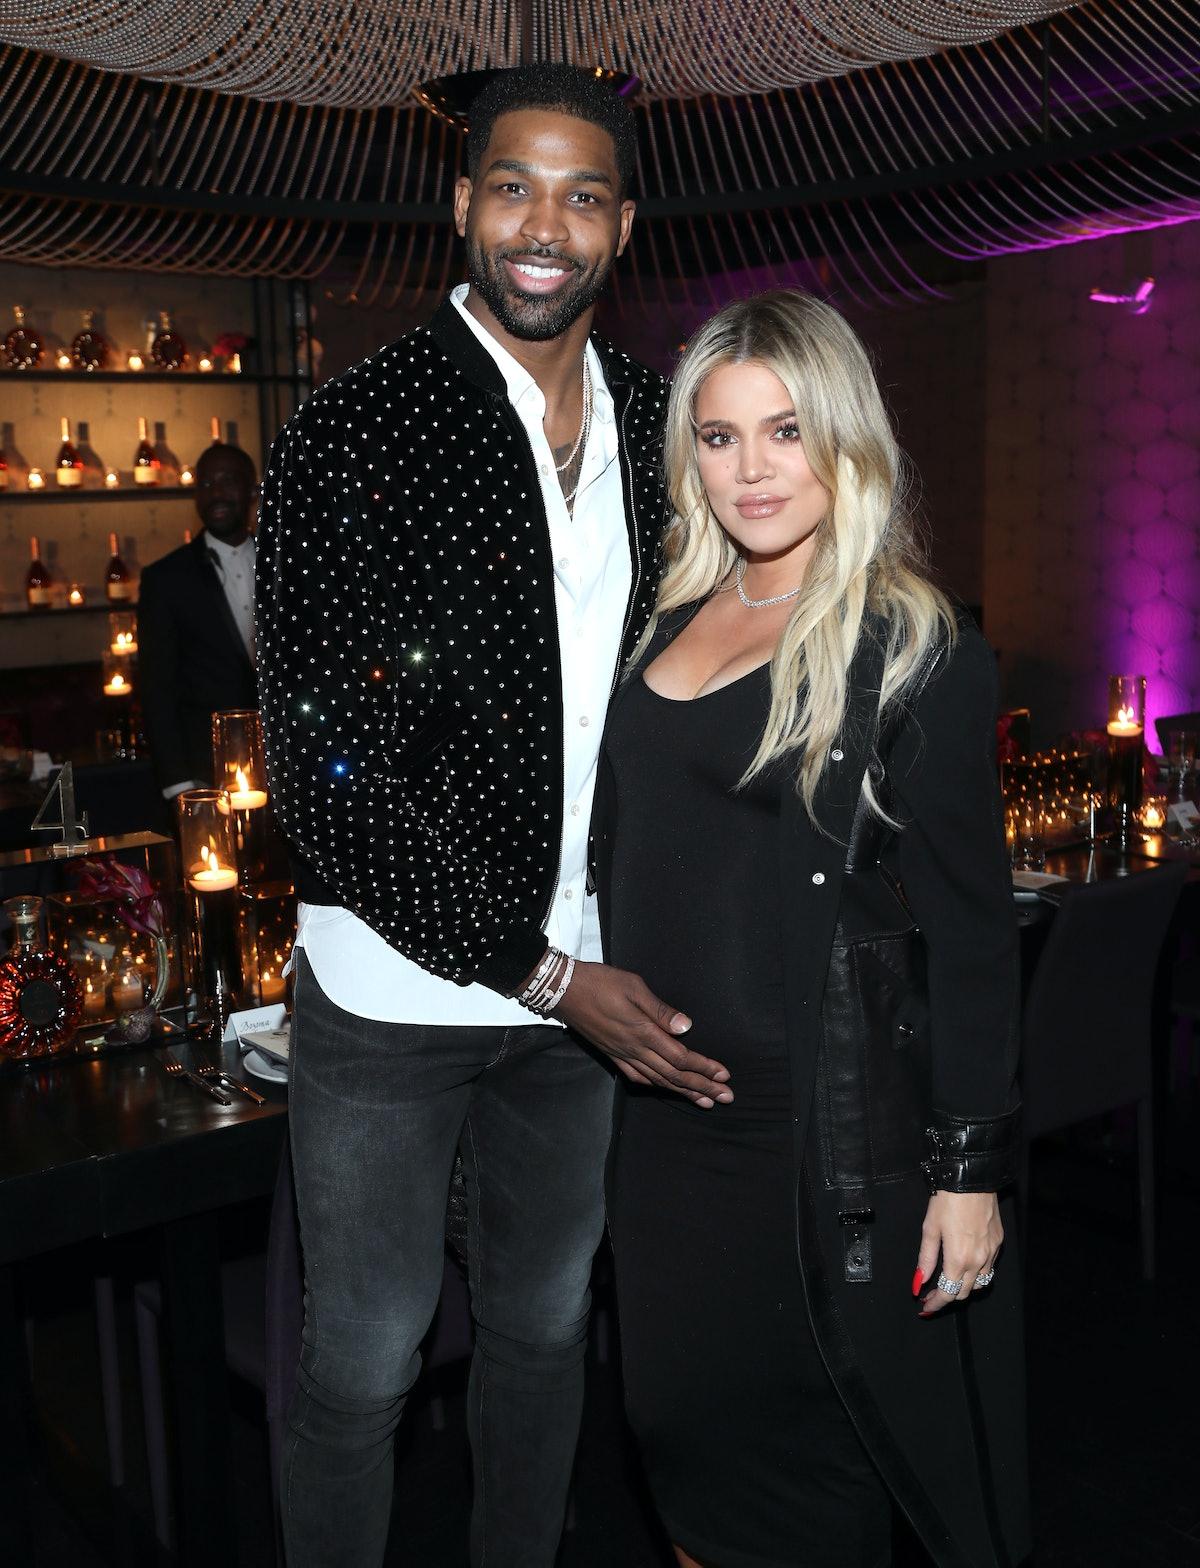 Khloé Kardashian and Tristan Thompson's quarantine is reportedly romantic